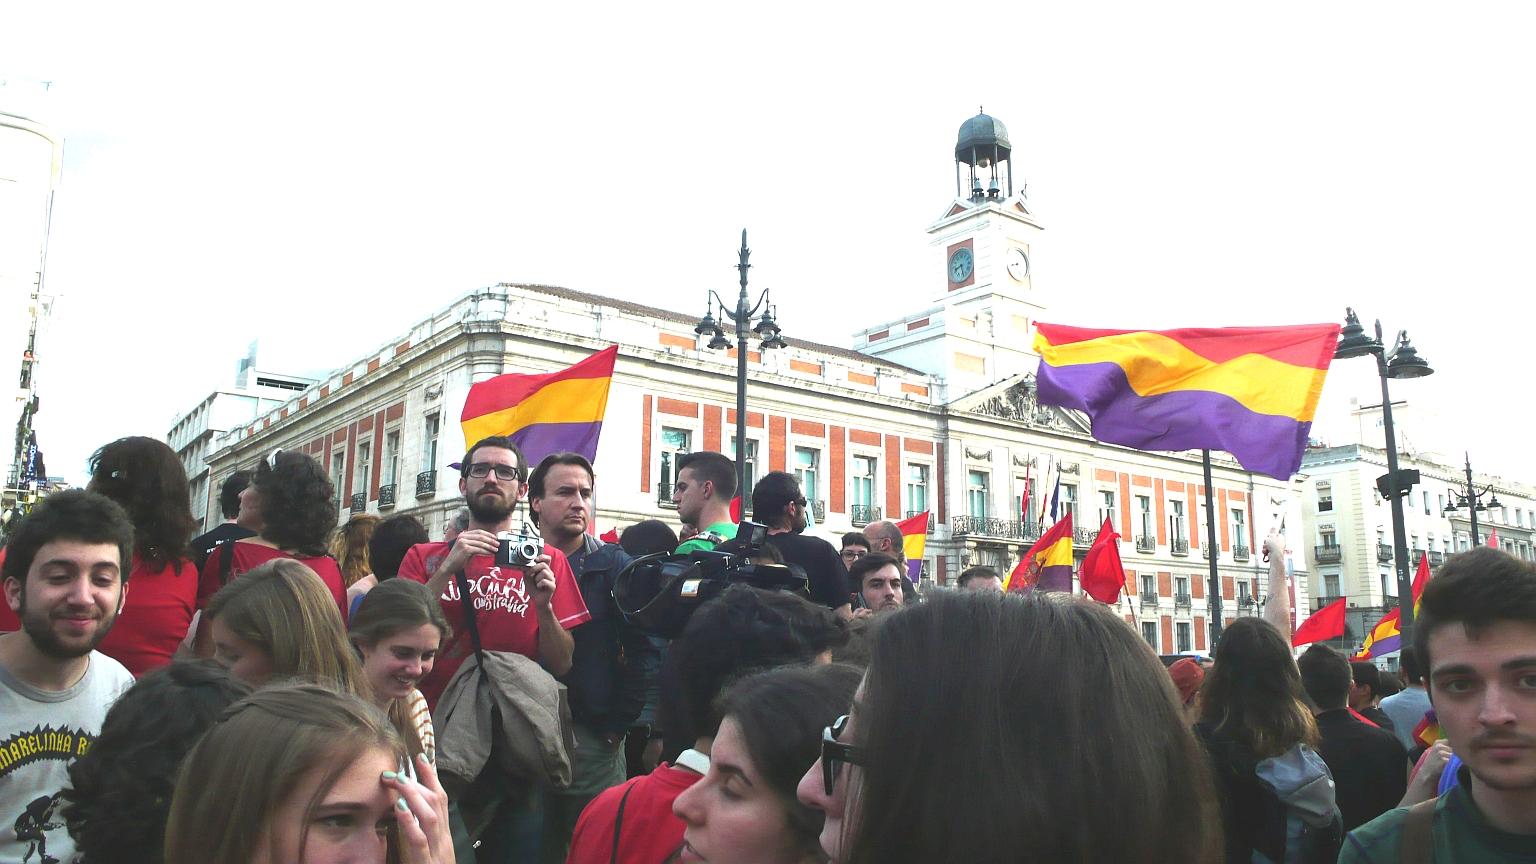 Puerta_del_Sol_Multitude_2014_06_02_2